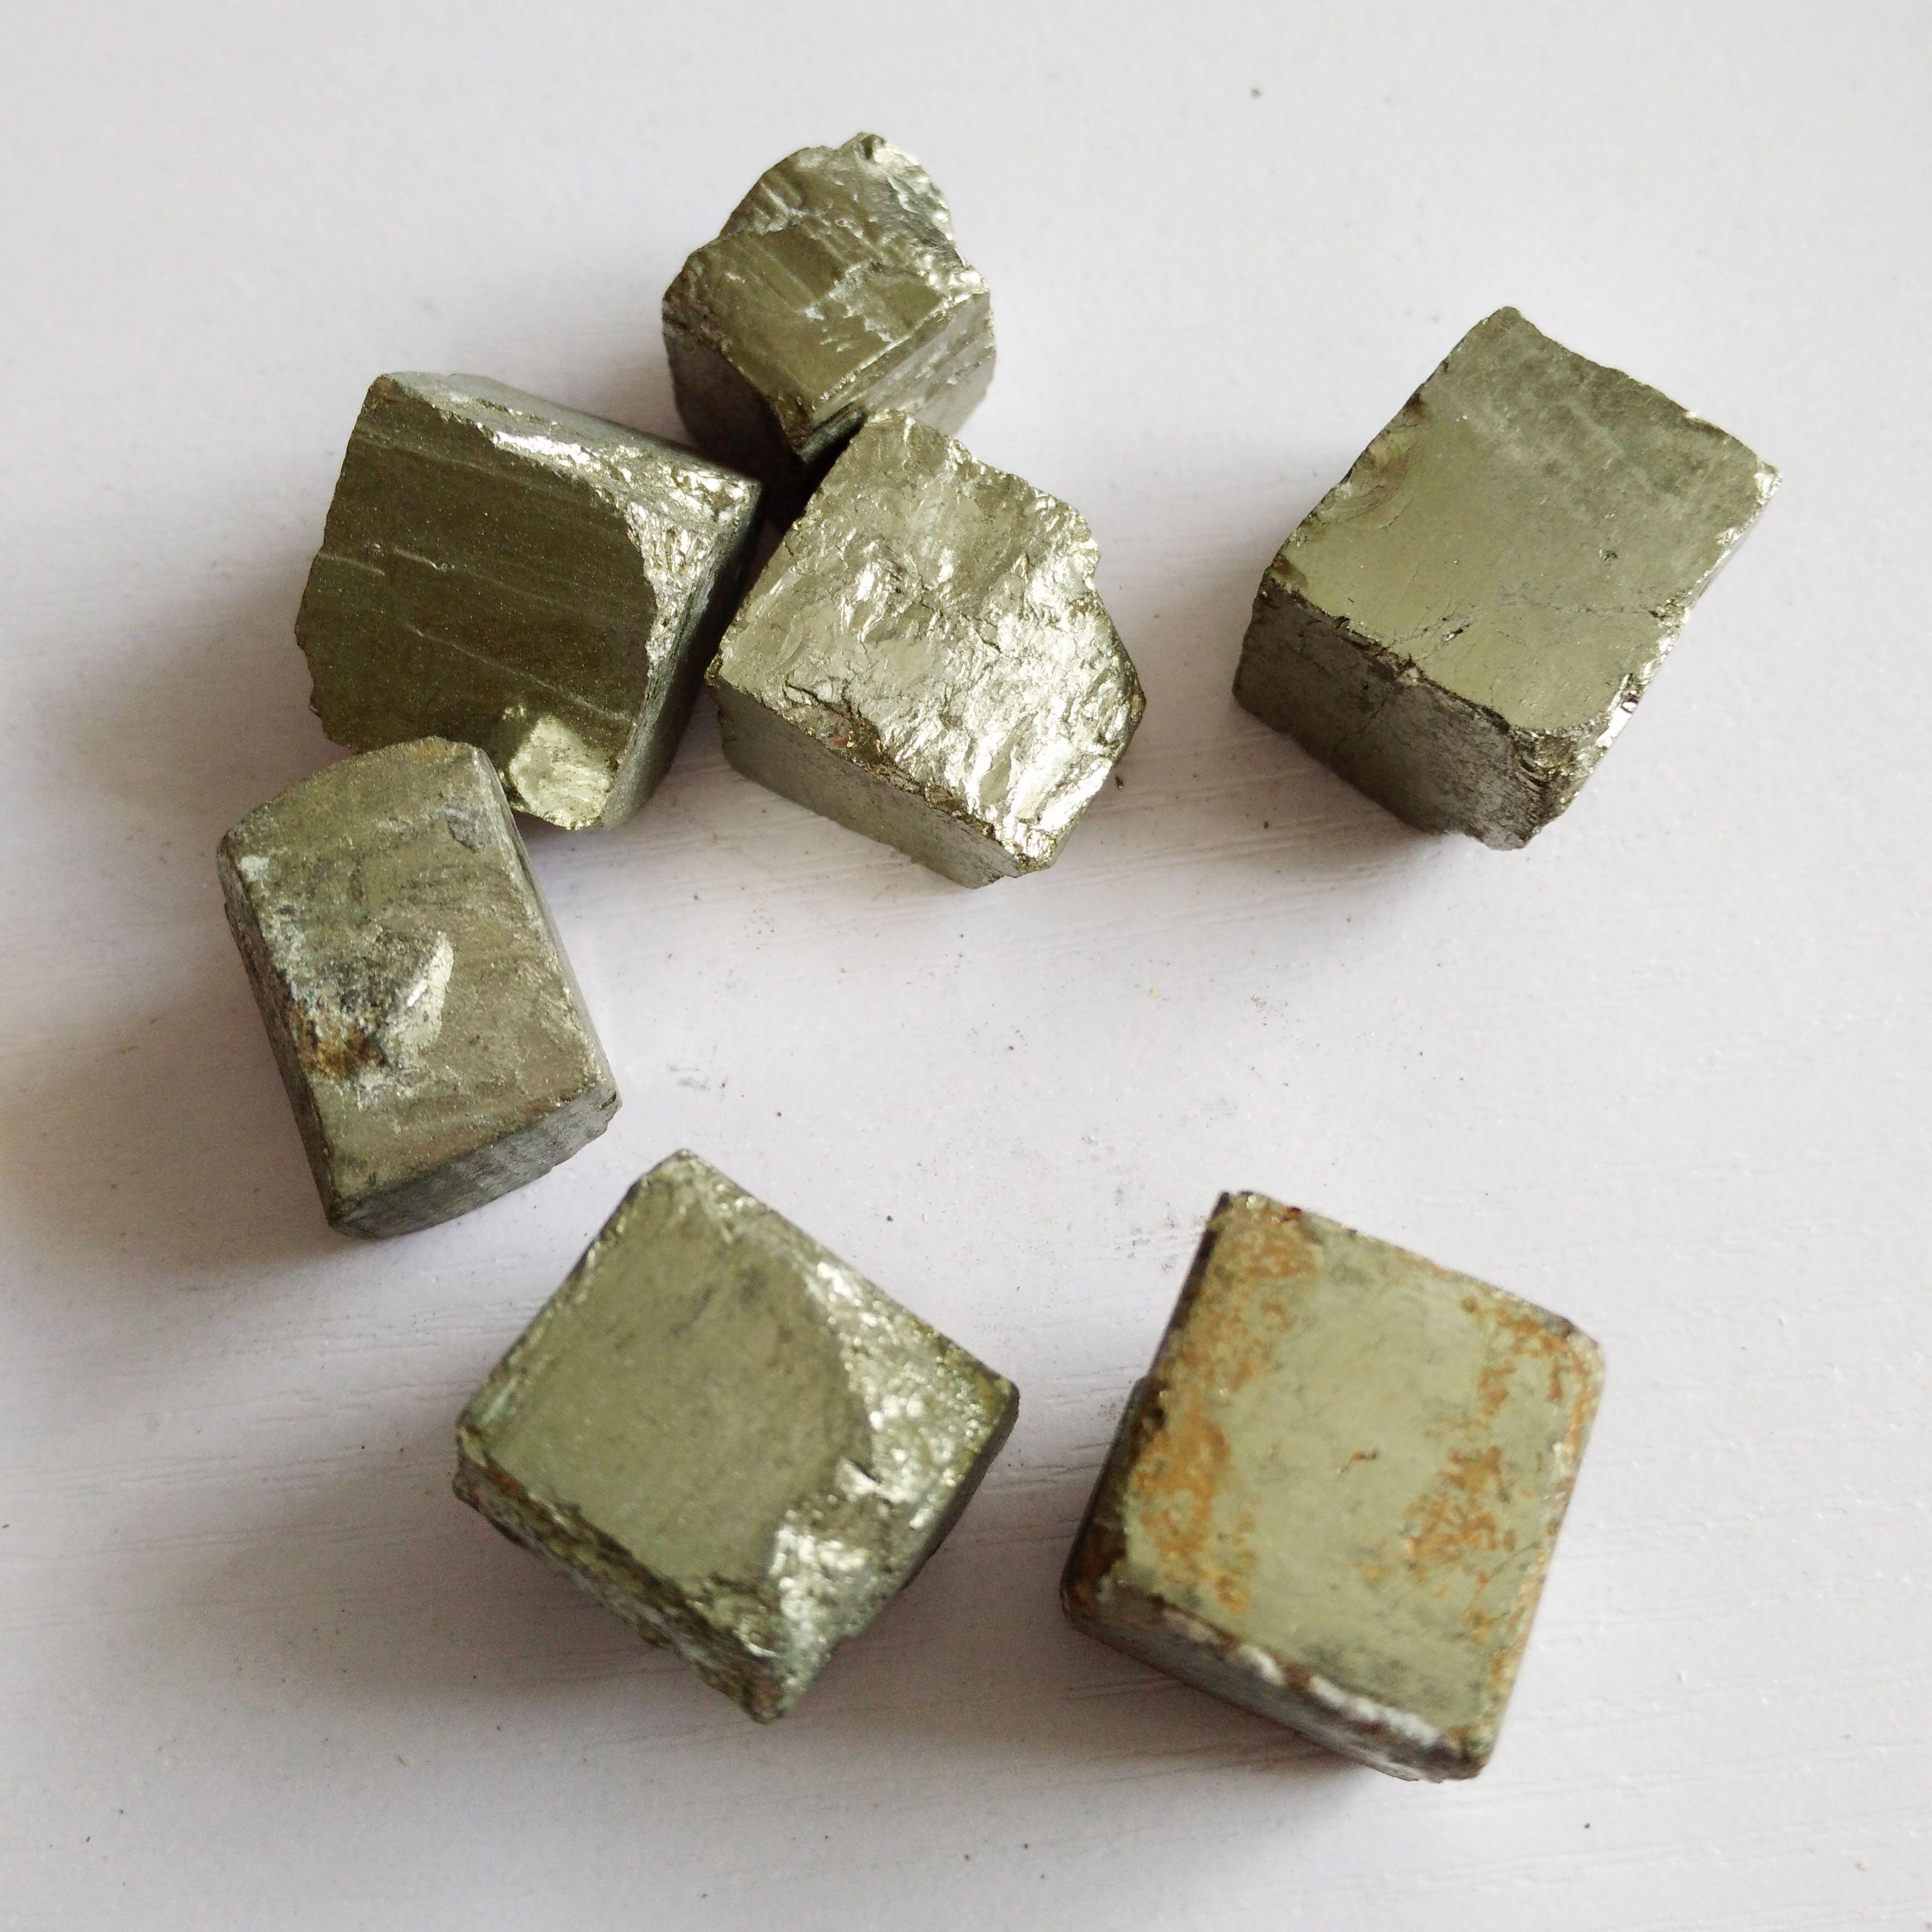 pedra de cura de cristal de cristal mineral natural encantador calcopirita cubo para venda caíram pedras s espécime cubo